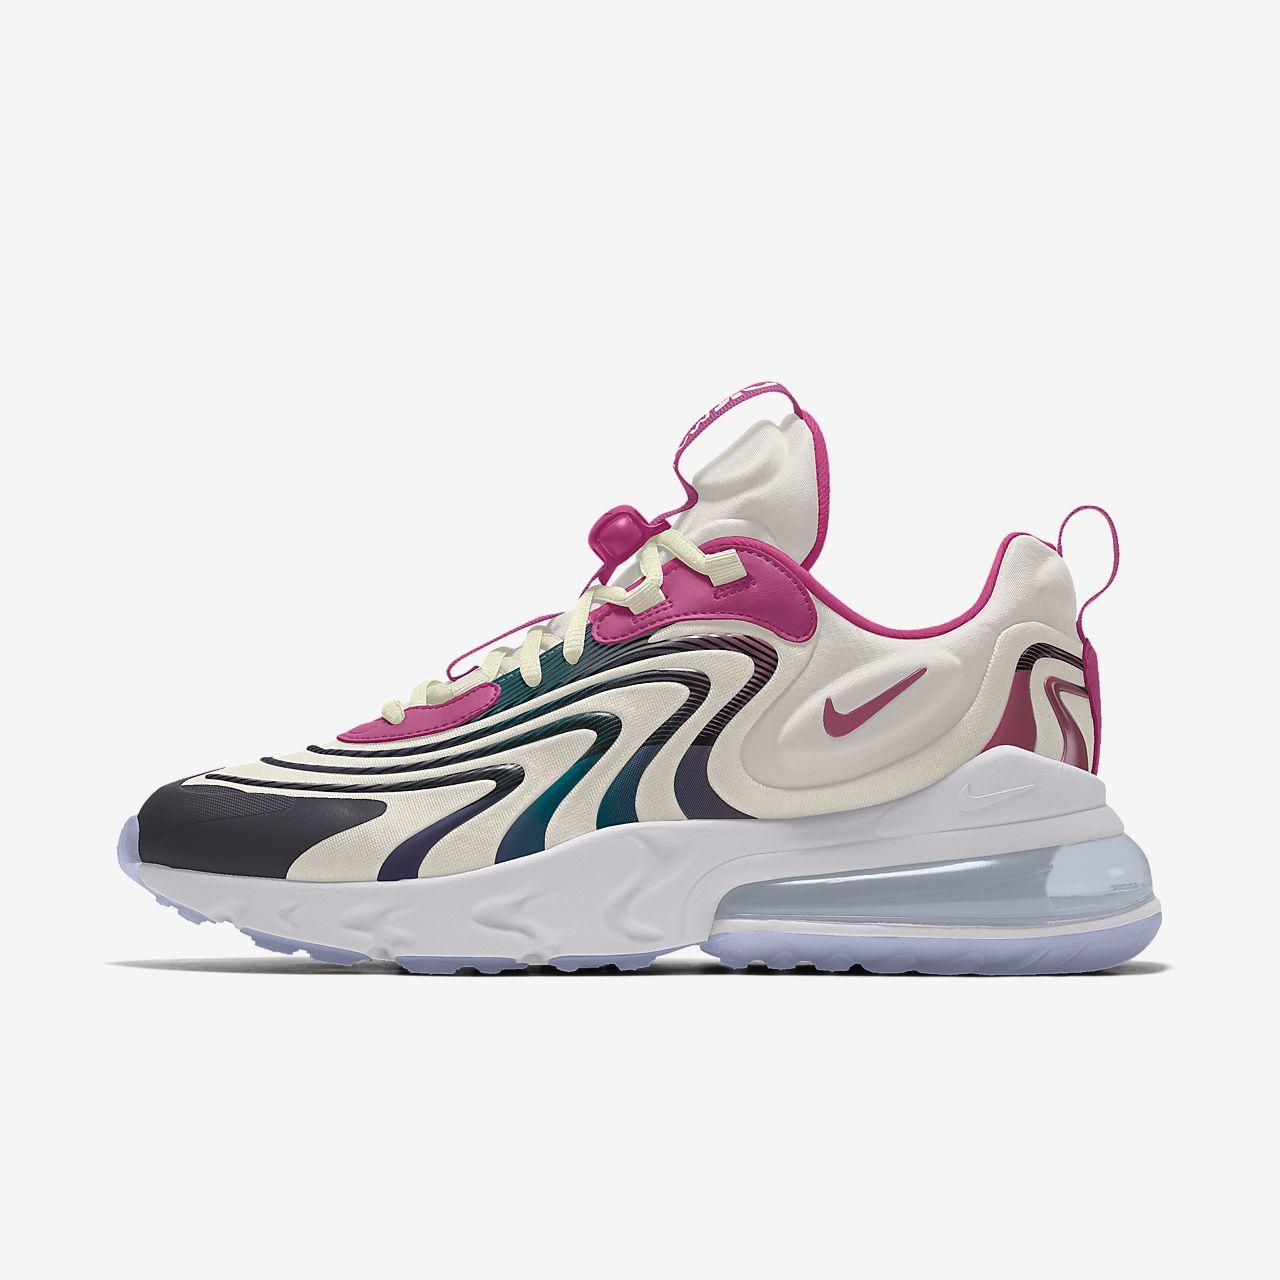 Nike Air Max 270 React ENG Premium By You Custom Lifestyle Shoe